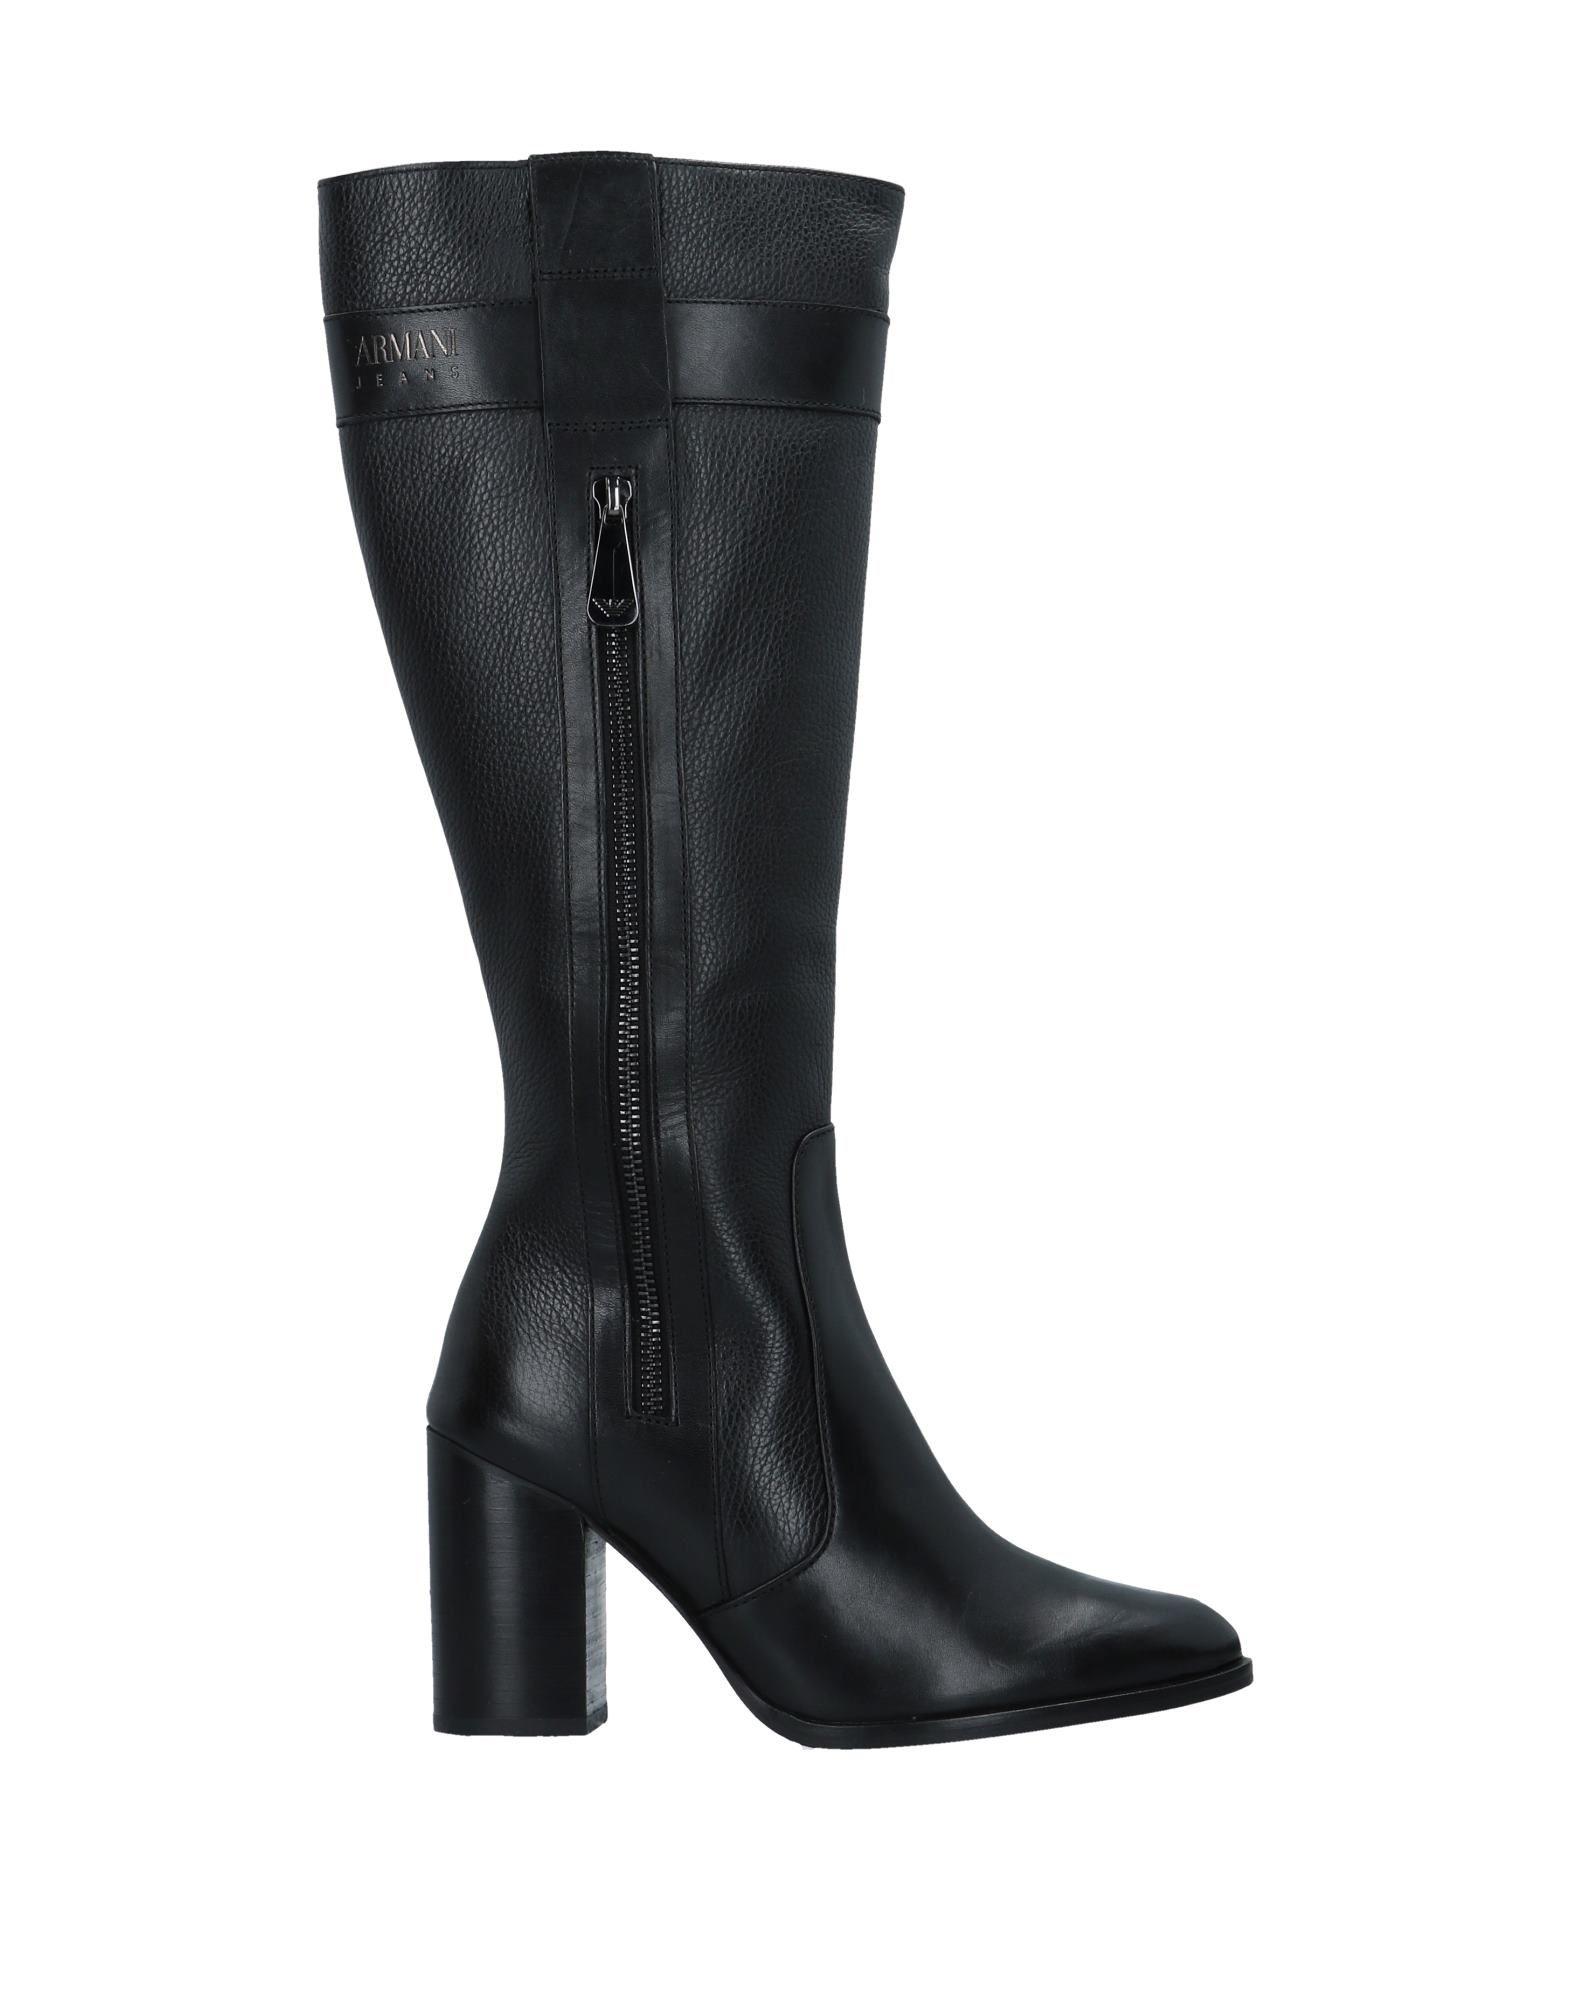 Armani Jeans Stiefel strapazierfähige Damen  11538236HJGut aussehende strapazierfähige Stiefel Schuhe 0e9a3d